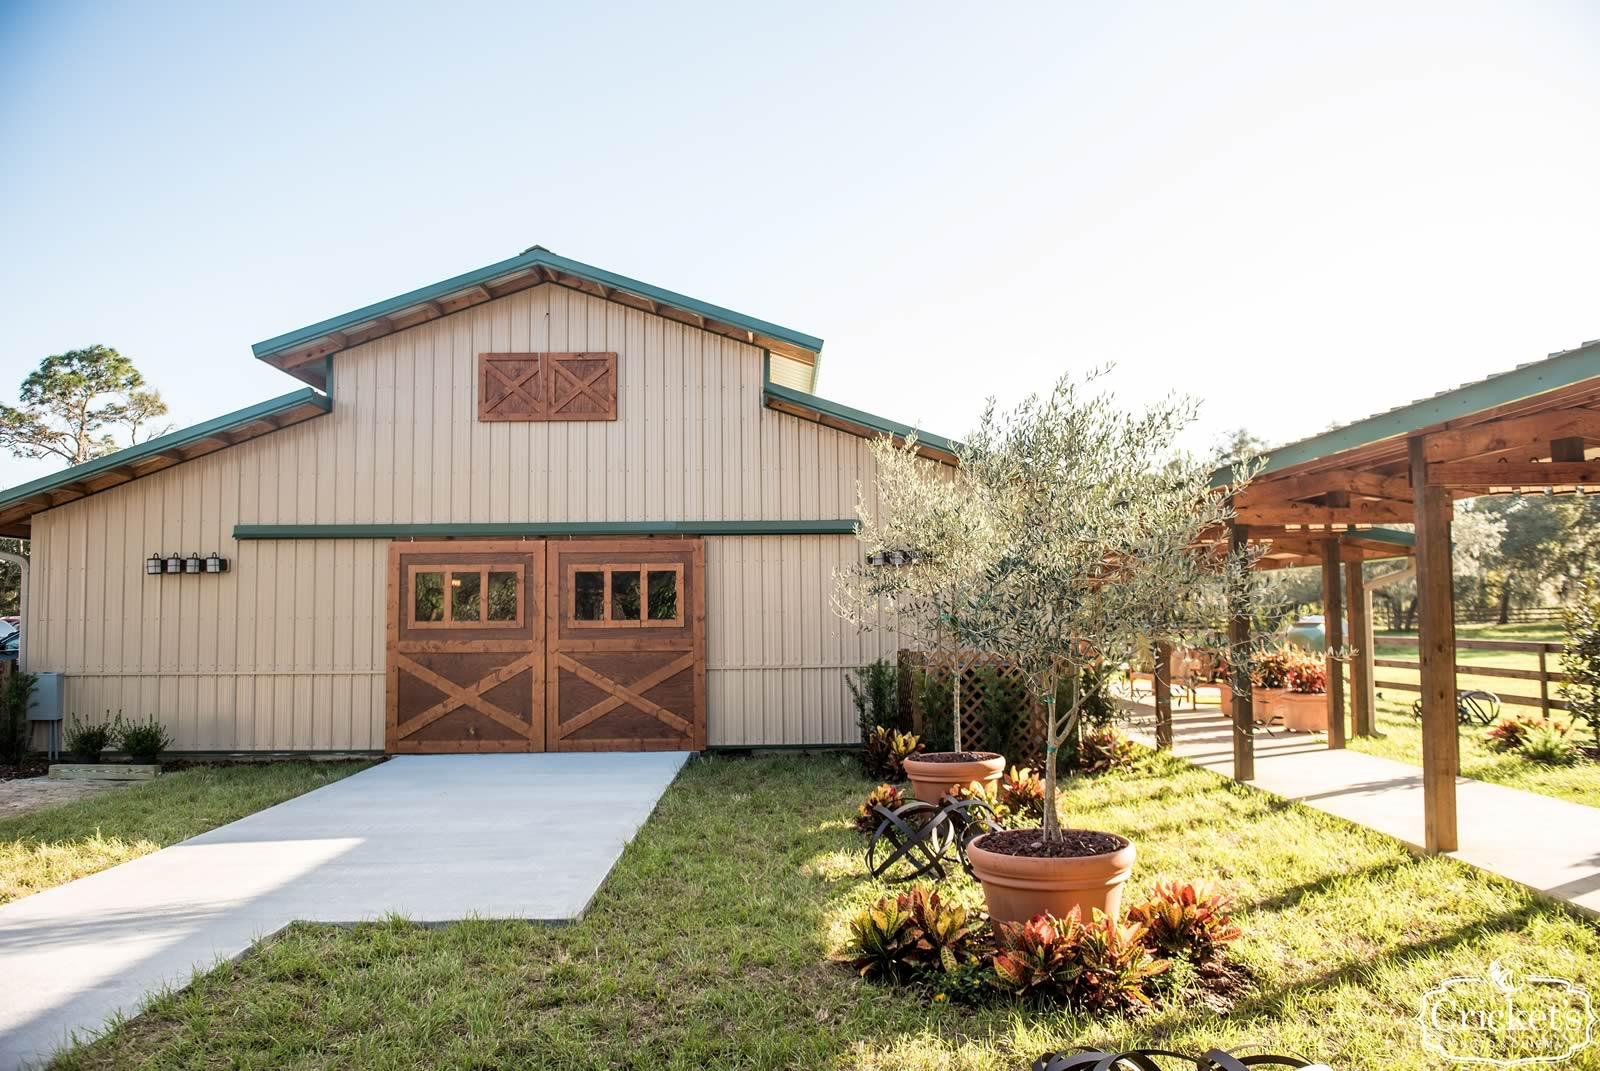 BLB Hacienda video - Barn Weddings Events Florida